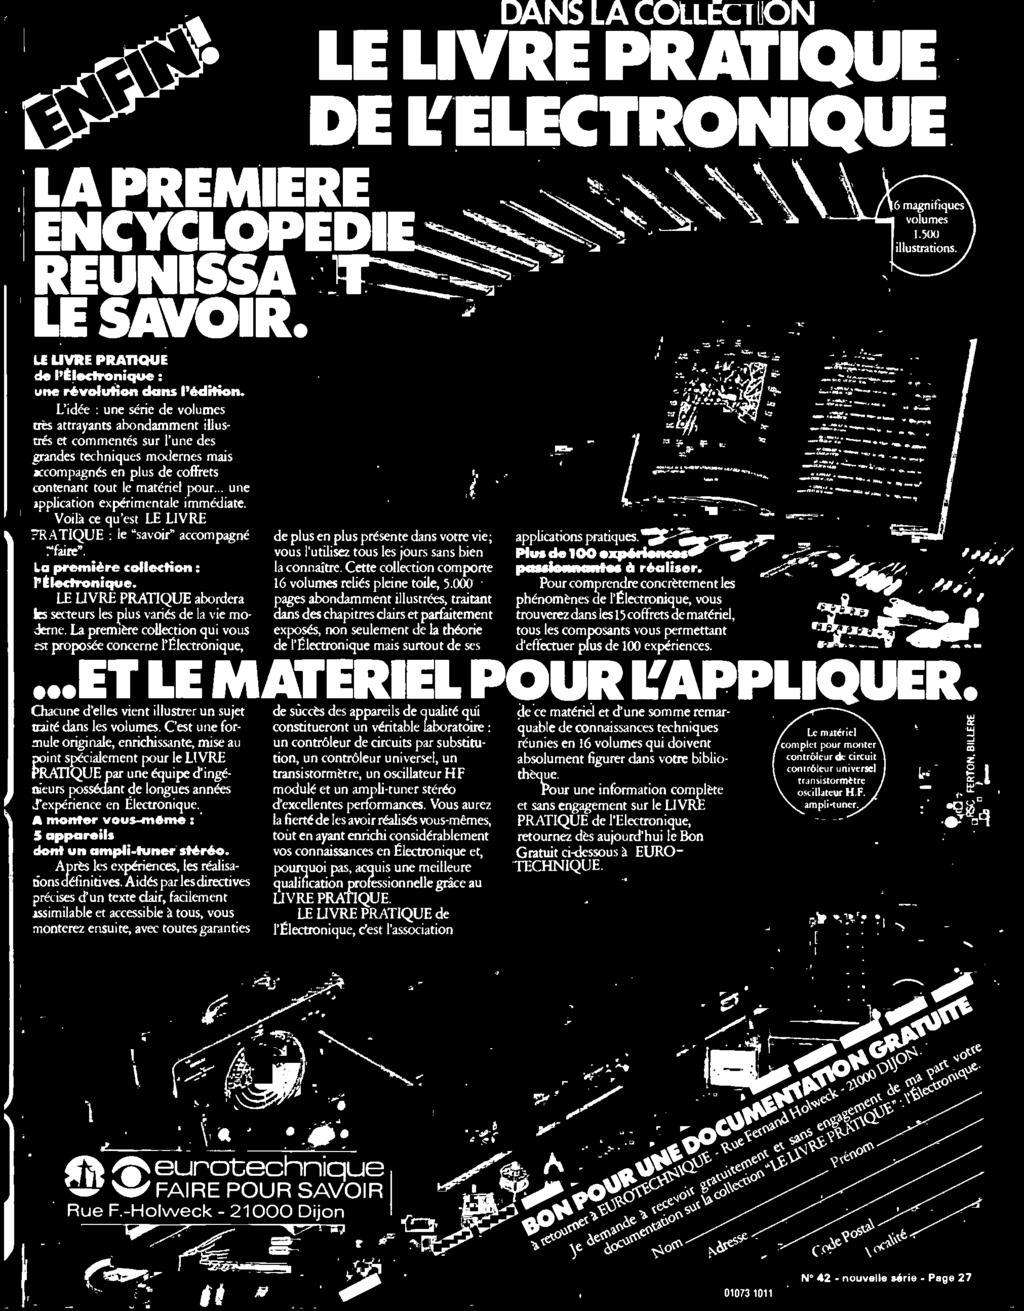 Le Jardin Du Thé Grenoble Inspirant Rrler Sations Kits Experimentations Nitiation Co Di 1 C Of 73 Frais Le Jardin Du Thé Grenoble